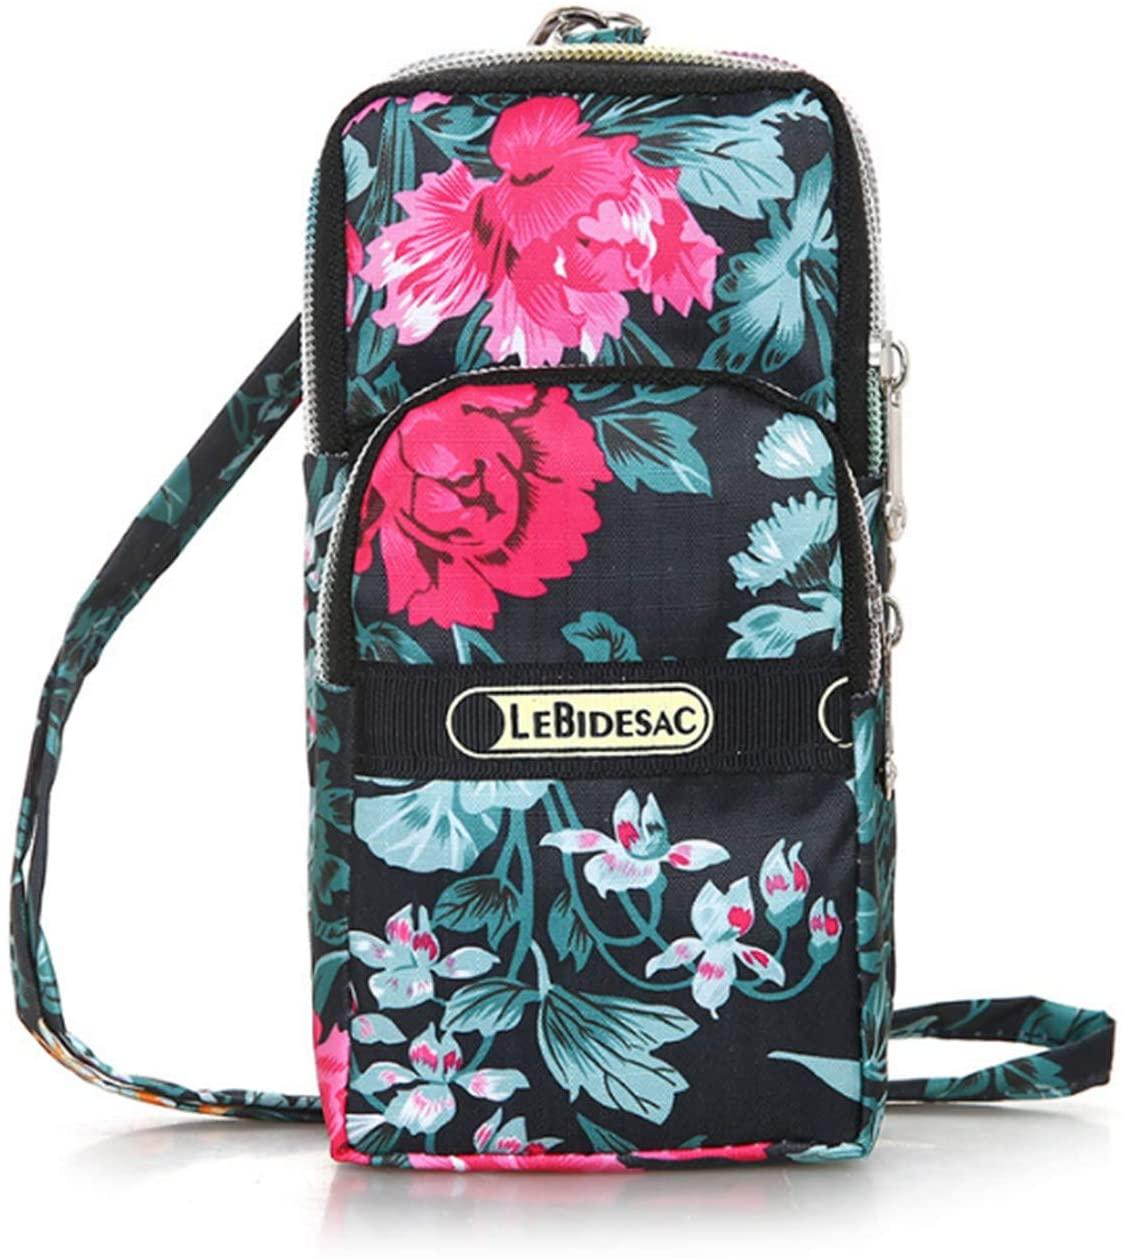 MODANA Fashion Sports Shoulder Bag Mini Wrist Purse Armband Bag Universal Phone Holder Pouch Case for iPhone/Samsung/LG/Moto/Black Berry/Sony/HTC/Nexus/Nokia/Lumia/Huawei and So on. (Flower-1)